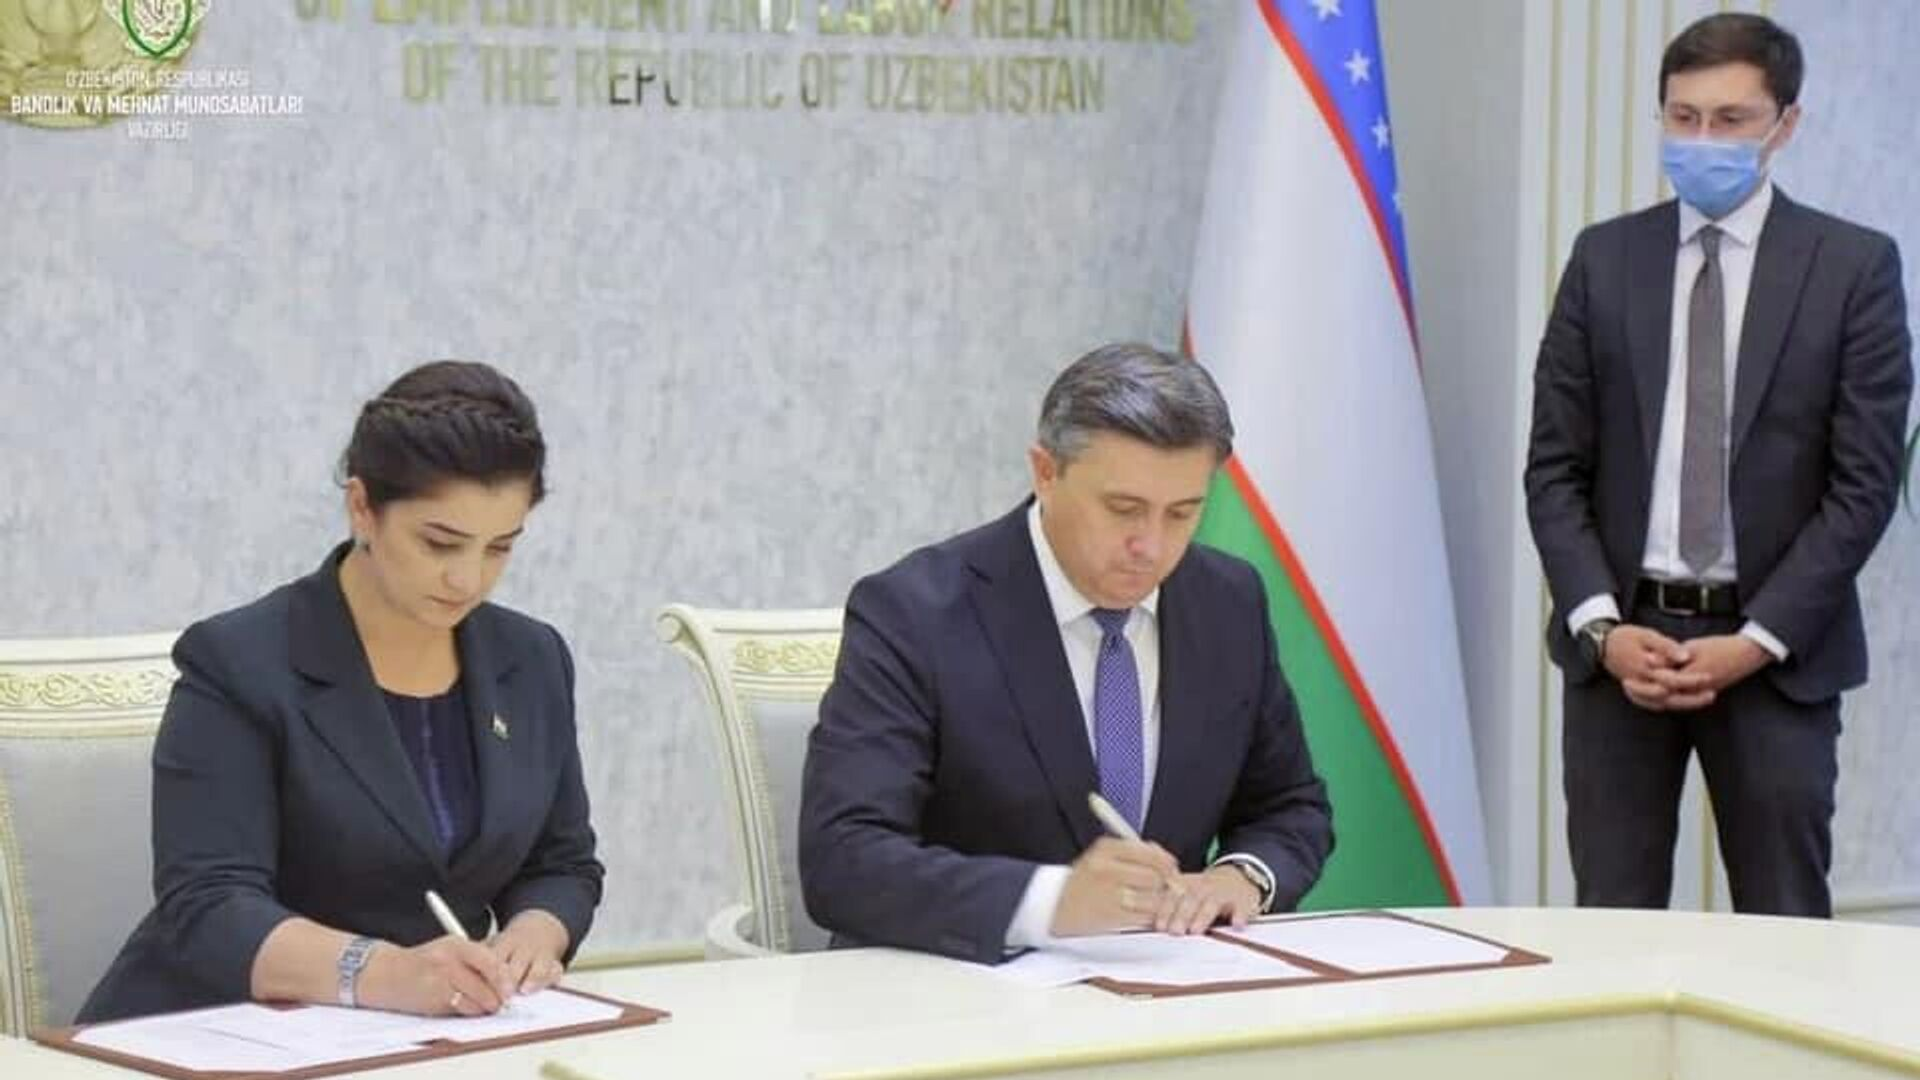 Минтруд Таджикистана и Узбекистана подписали 2 соглашения - Sputnik Тоҷикистон, 1920, 10.08.2021